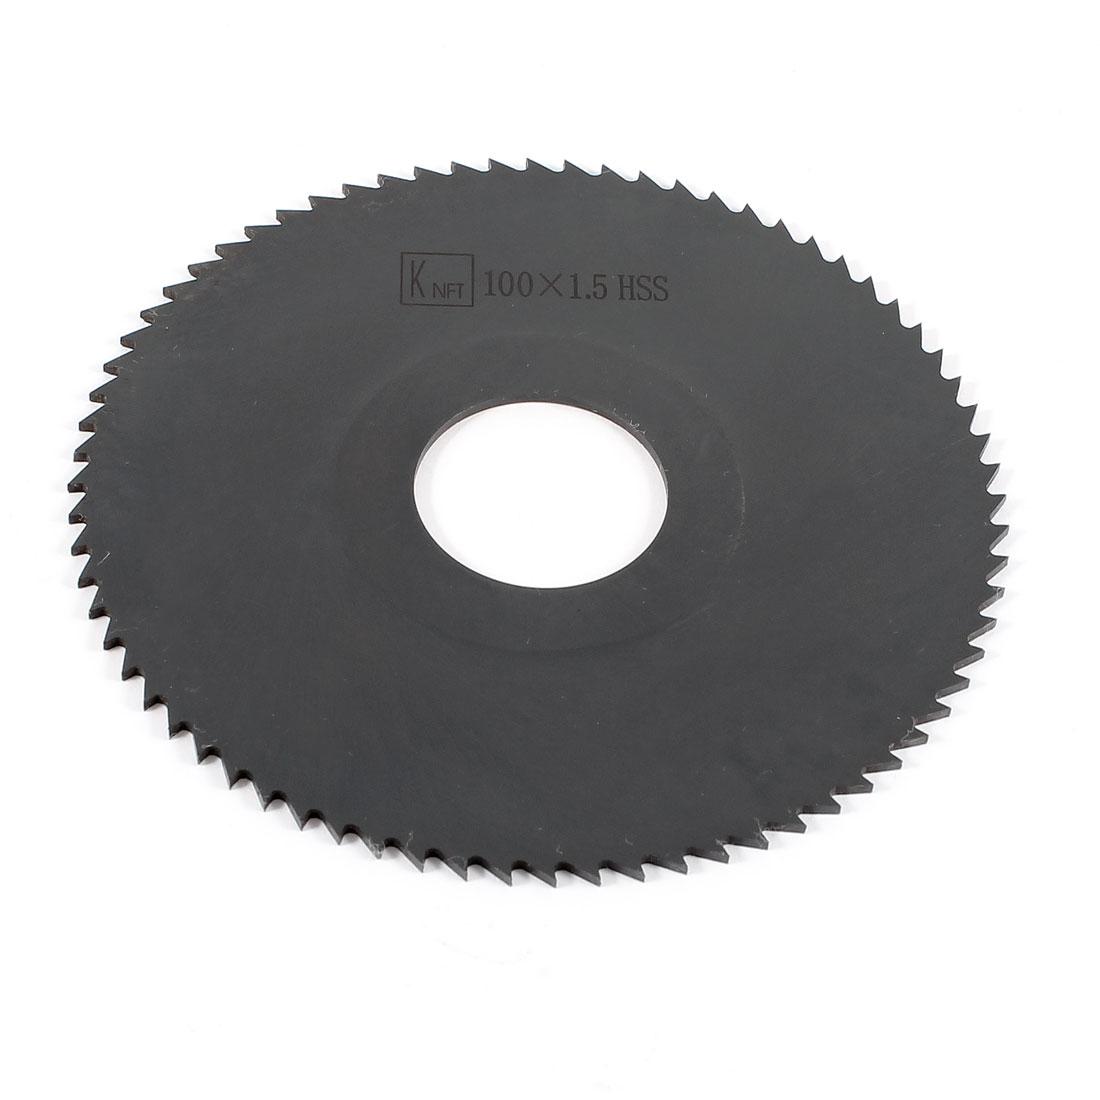 Hand Tool 100mm x 27mm x 1.5mm 72 Peg Teeth HSS Slitting Saw Cutter